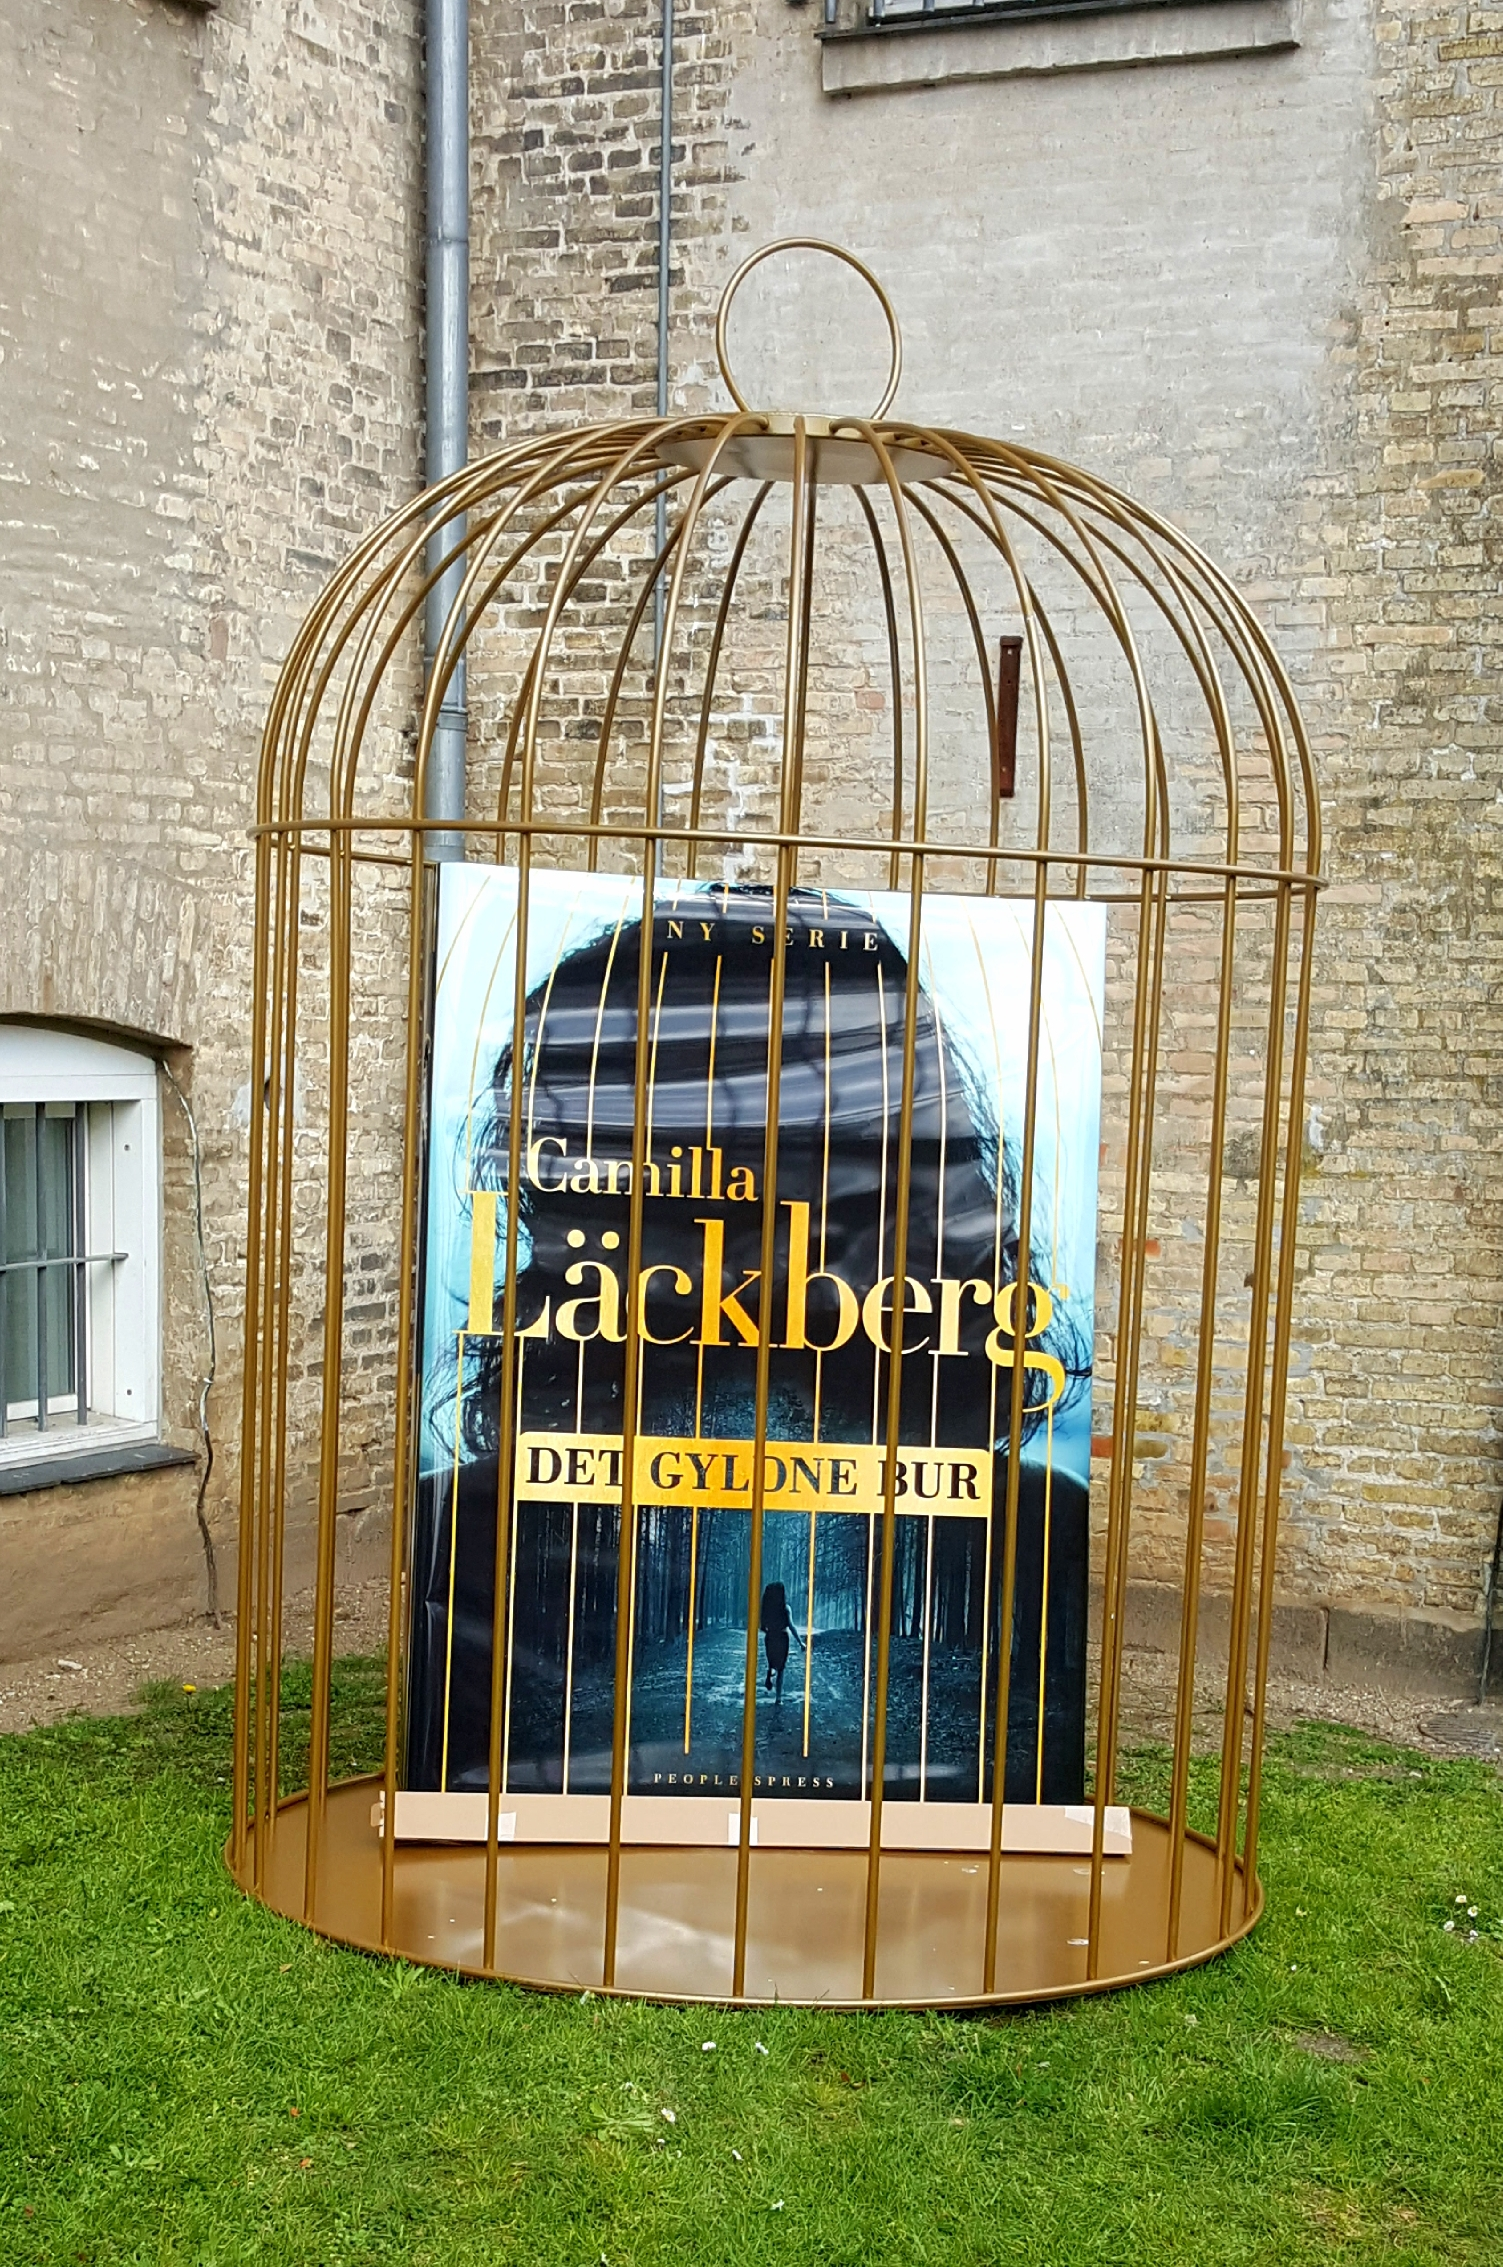 Det gyldne bur af Camilla Läckberg